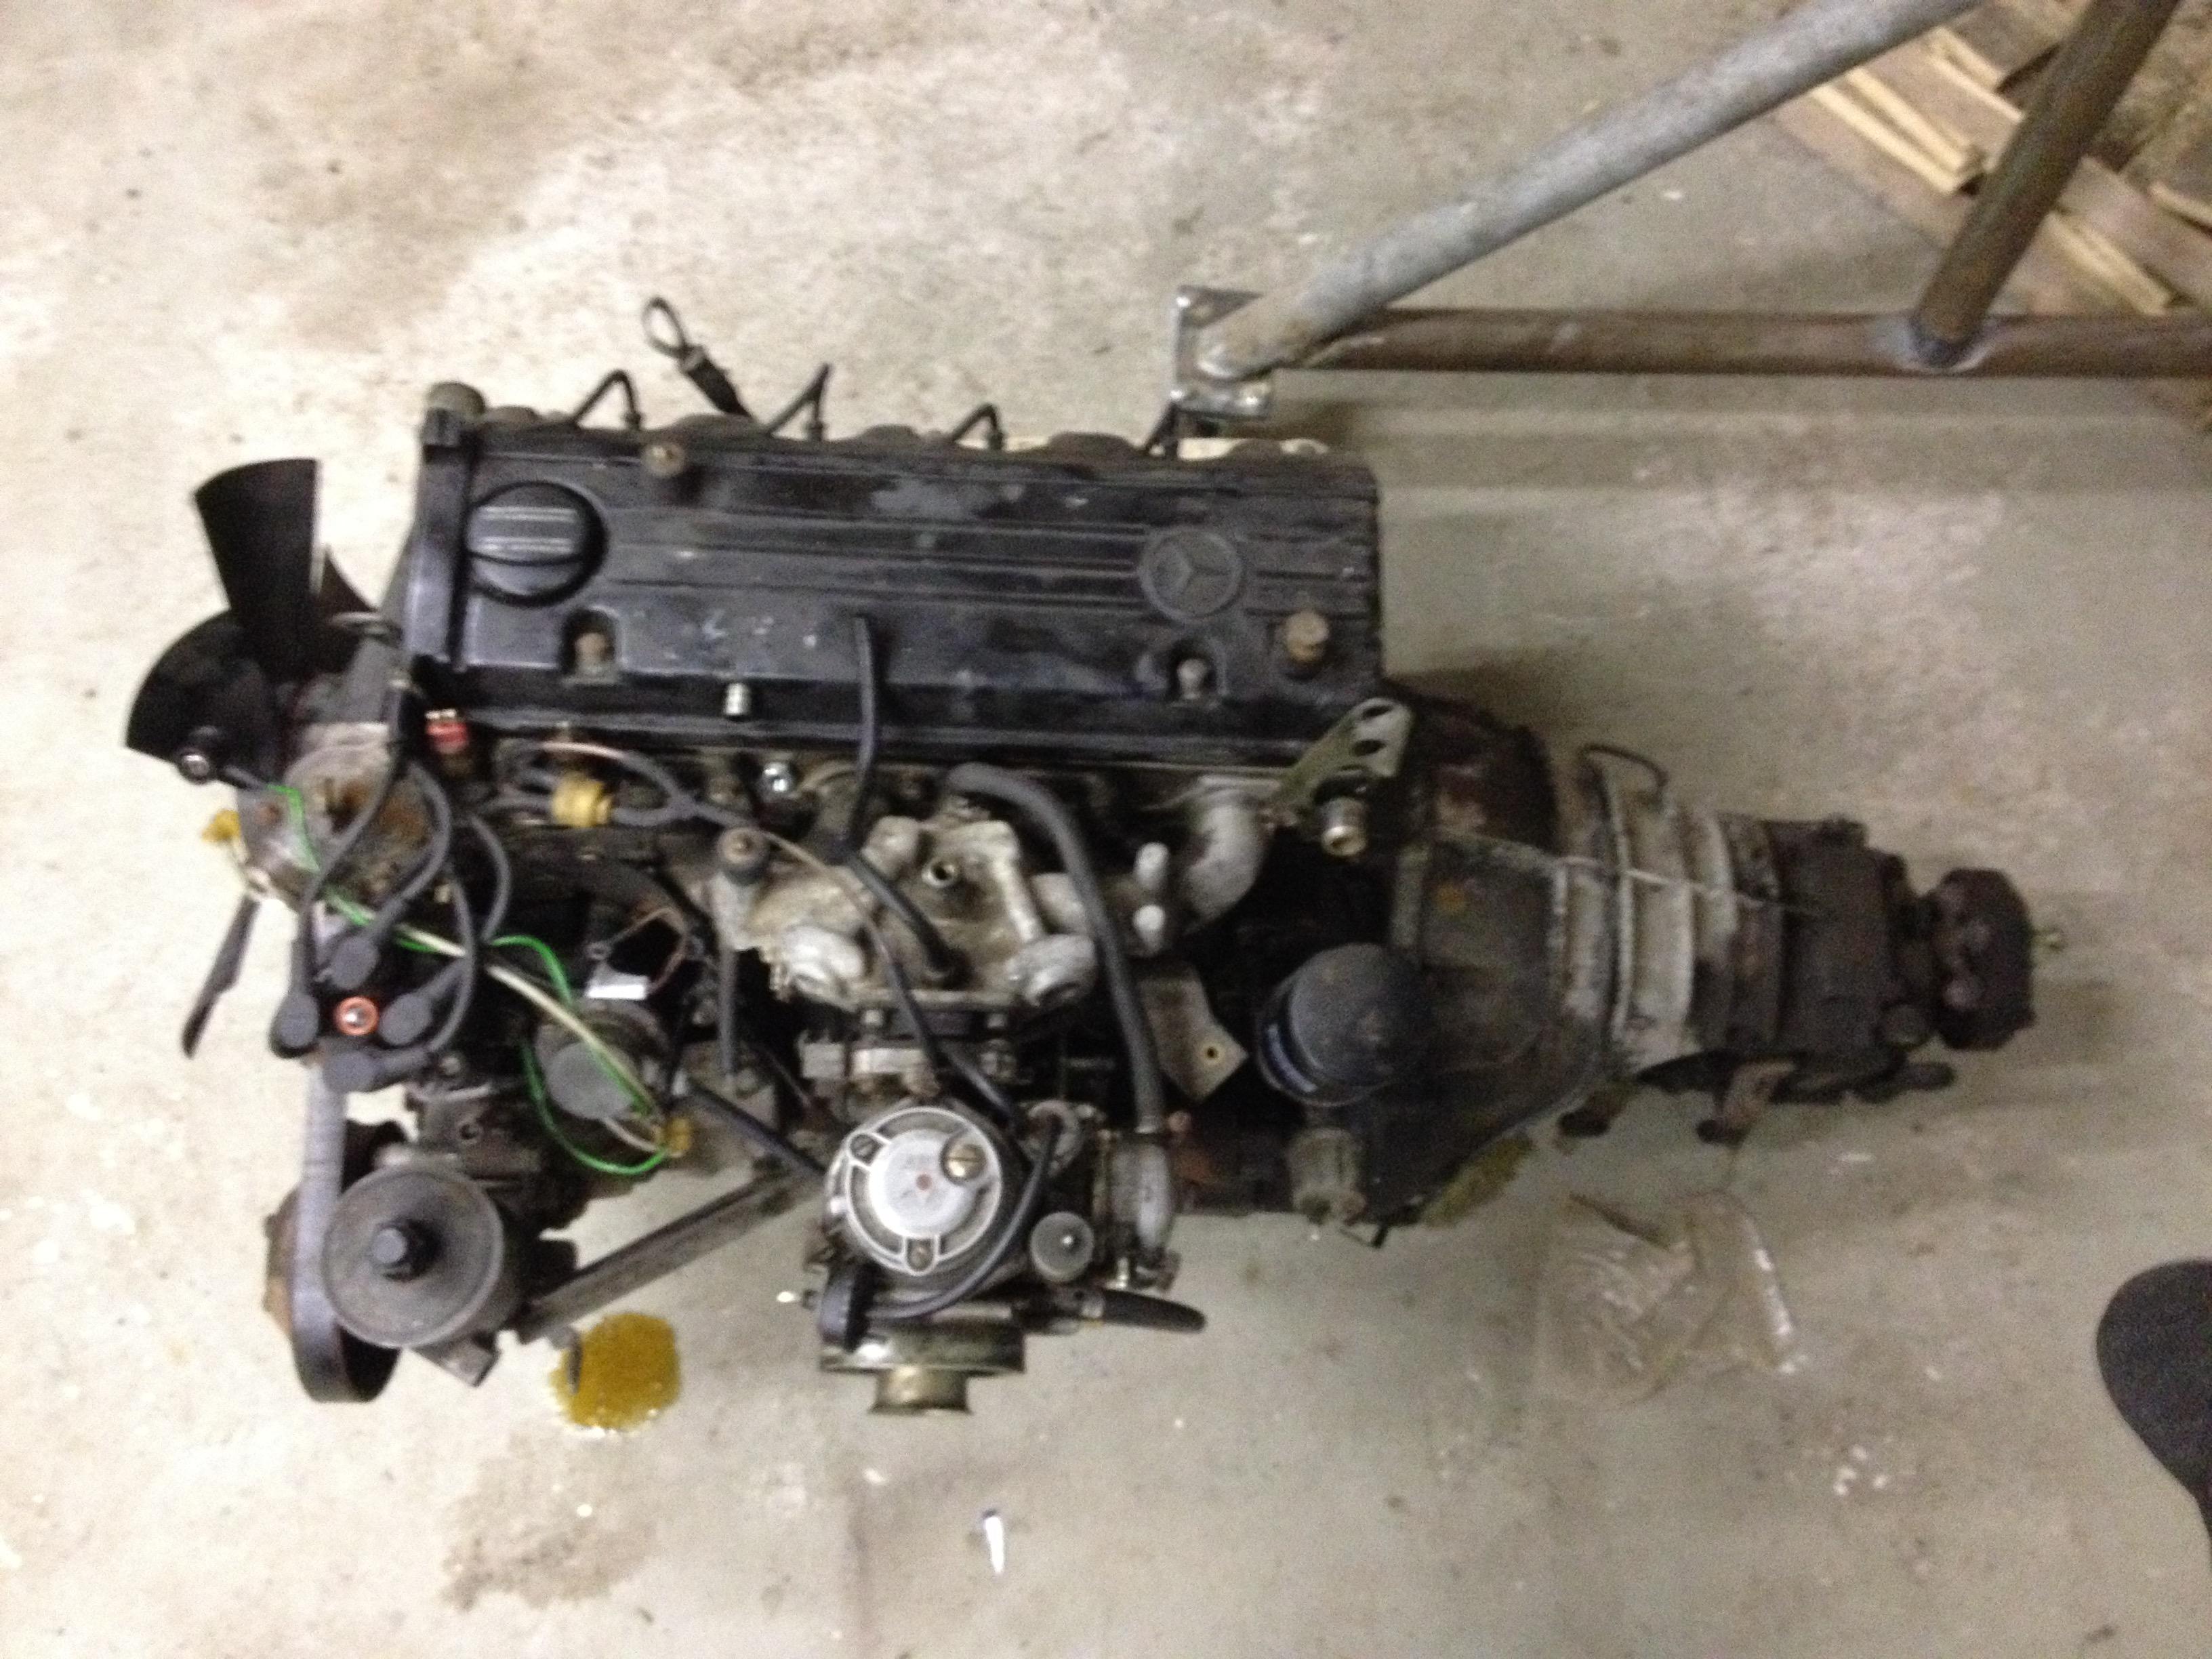 Mercedes 190 V12 project both engine's are out - JMSpeedshop !